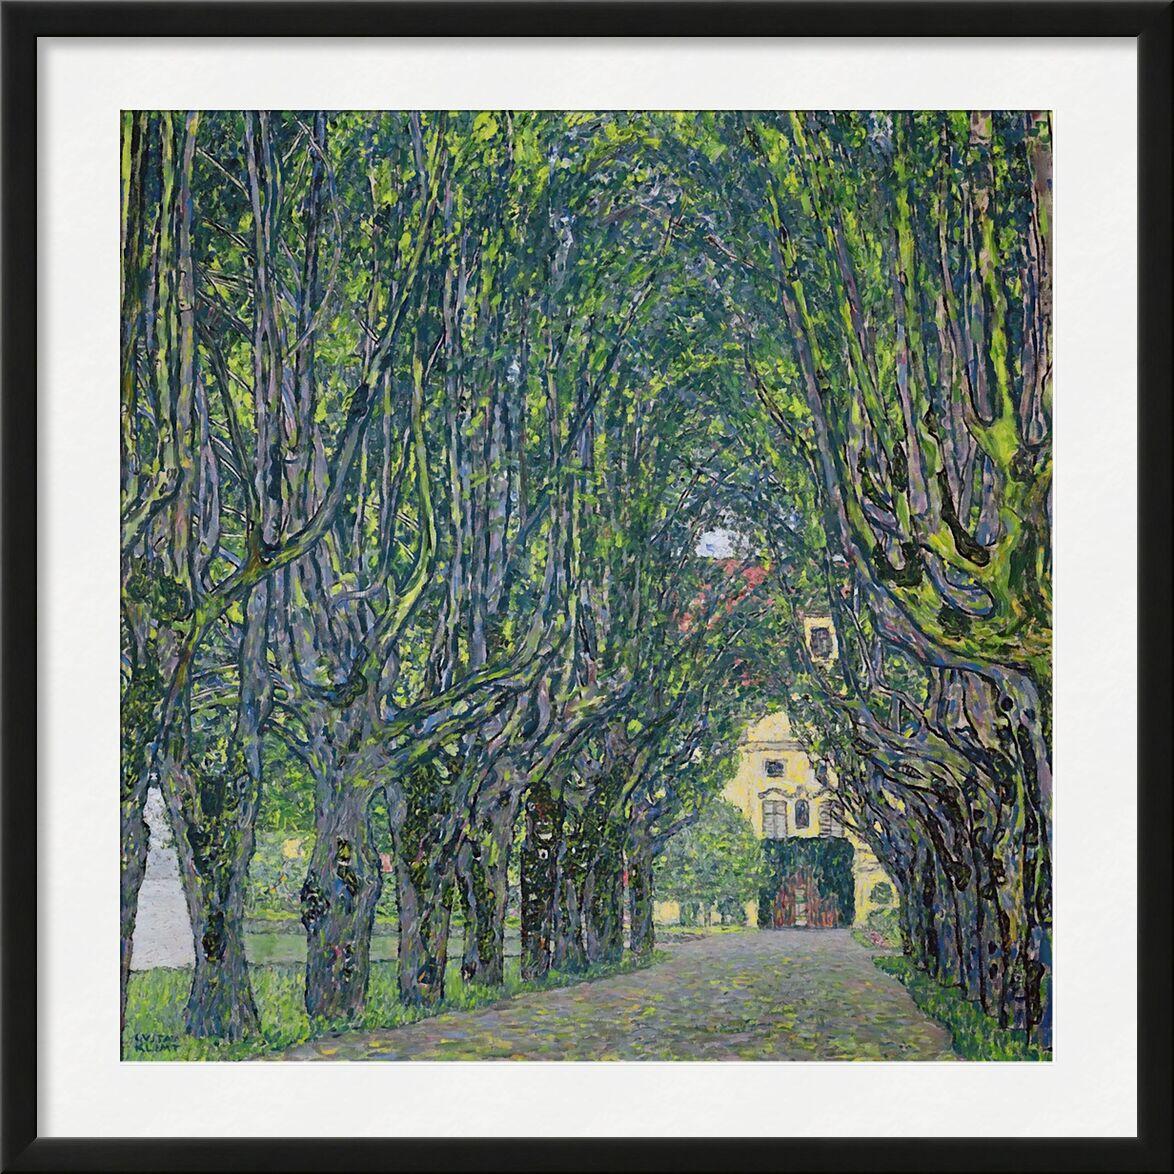 Avenue in the Park of Kammer Castle, 1912 - KLIMT von AUX BEAUX-ARTS, Prodi Art, KLIMT, Malerei, grün, Bäume, Haus, Weg, Gasse